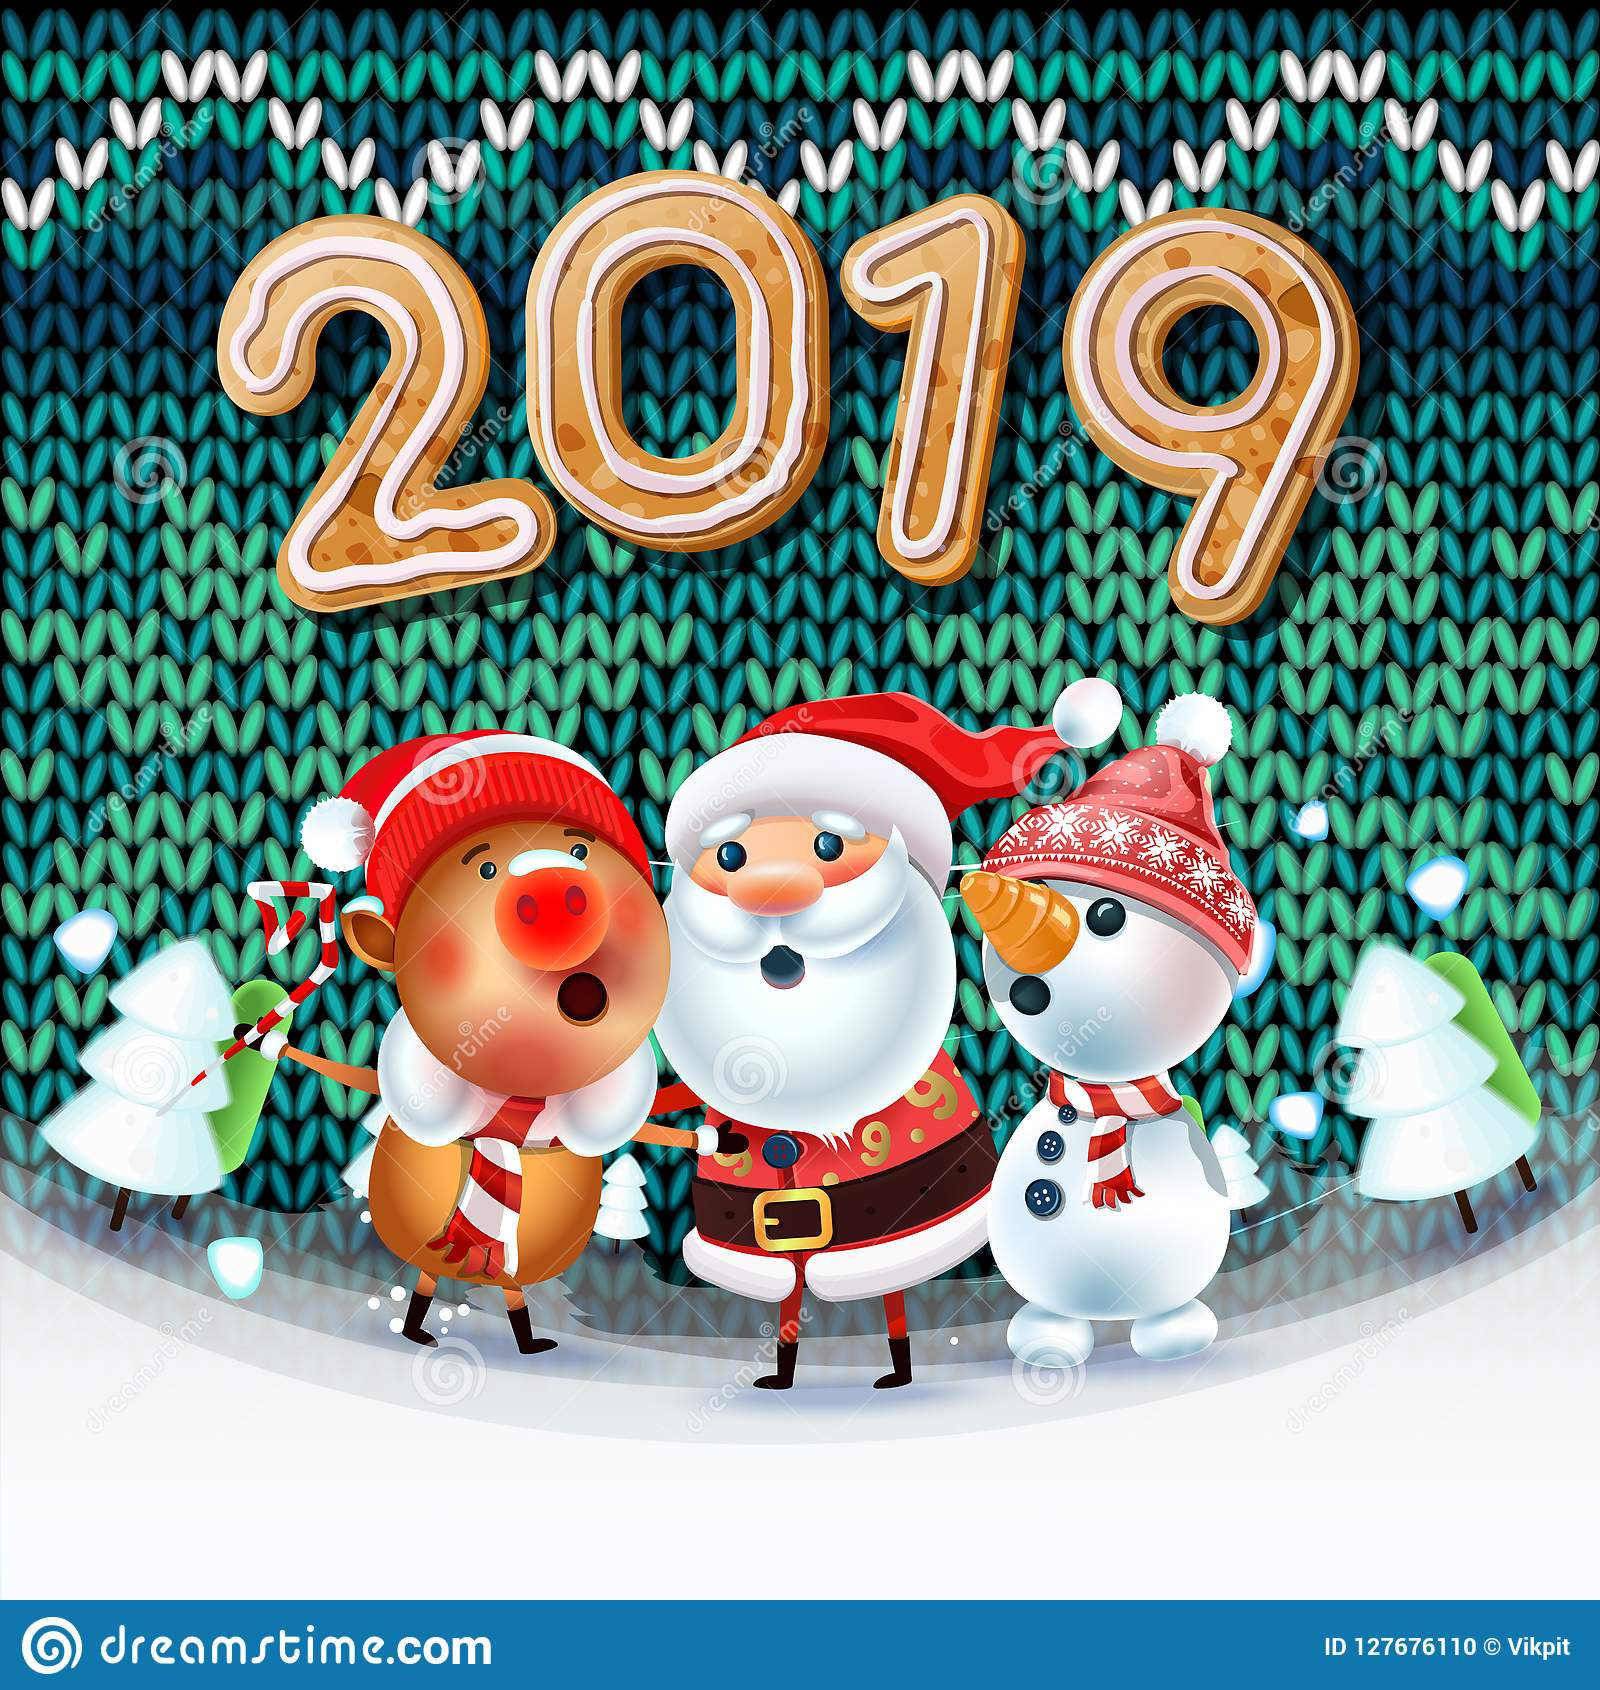 Chanson Joyeux Noel.Joyeux Noel 2019 Illustration De Vecteur Illustration Du